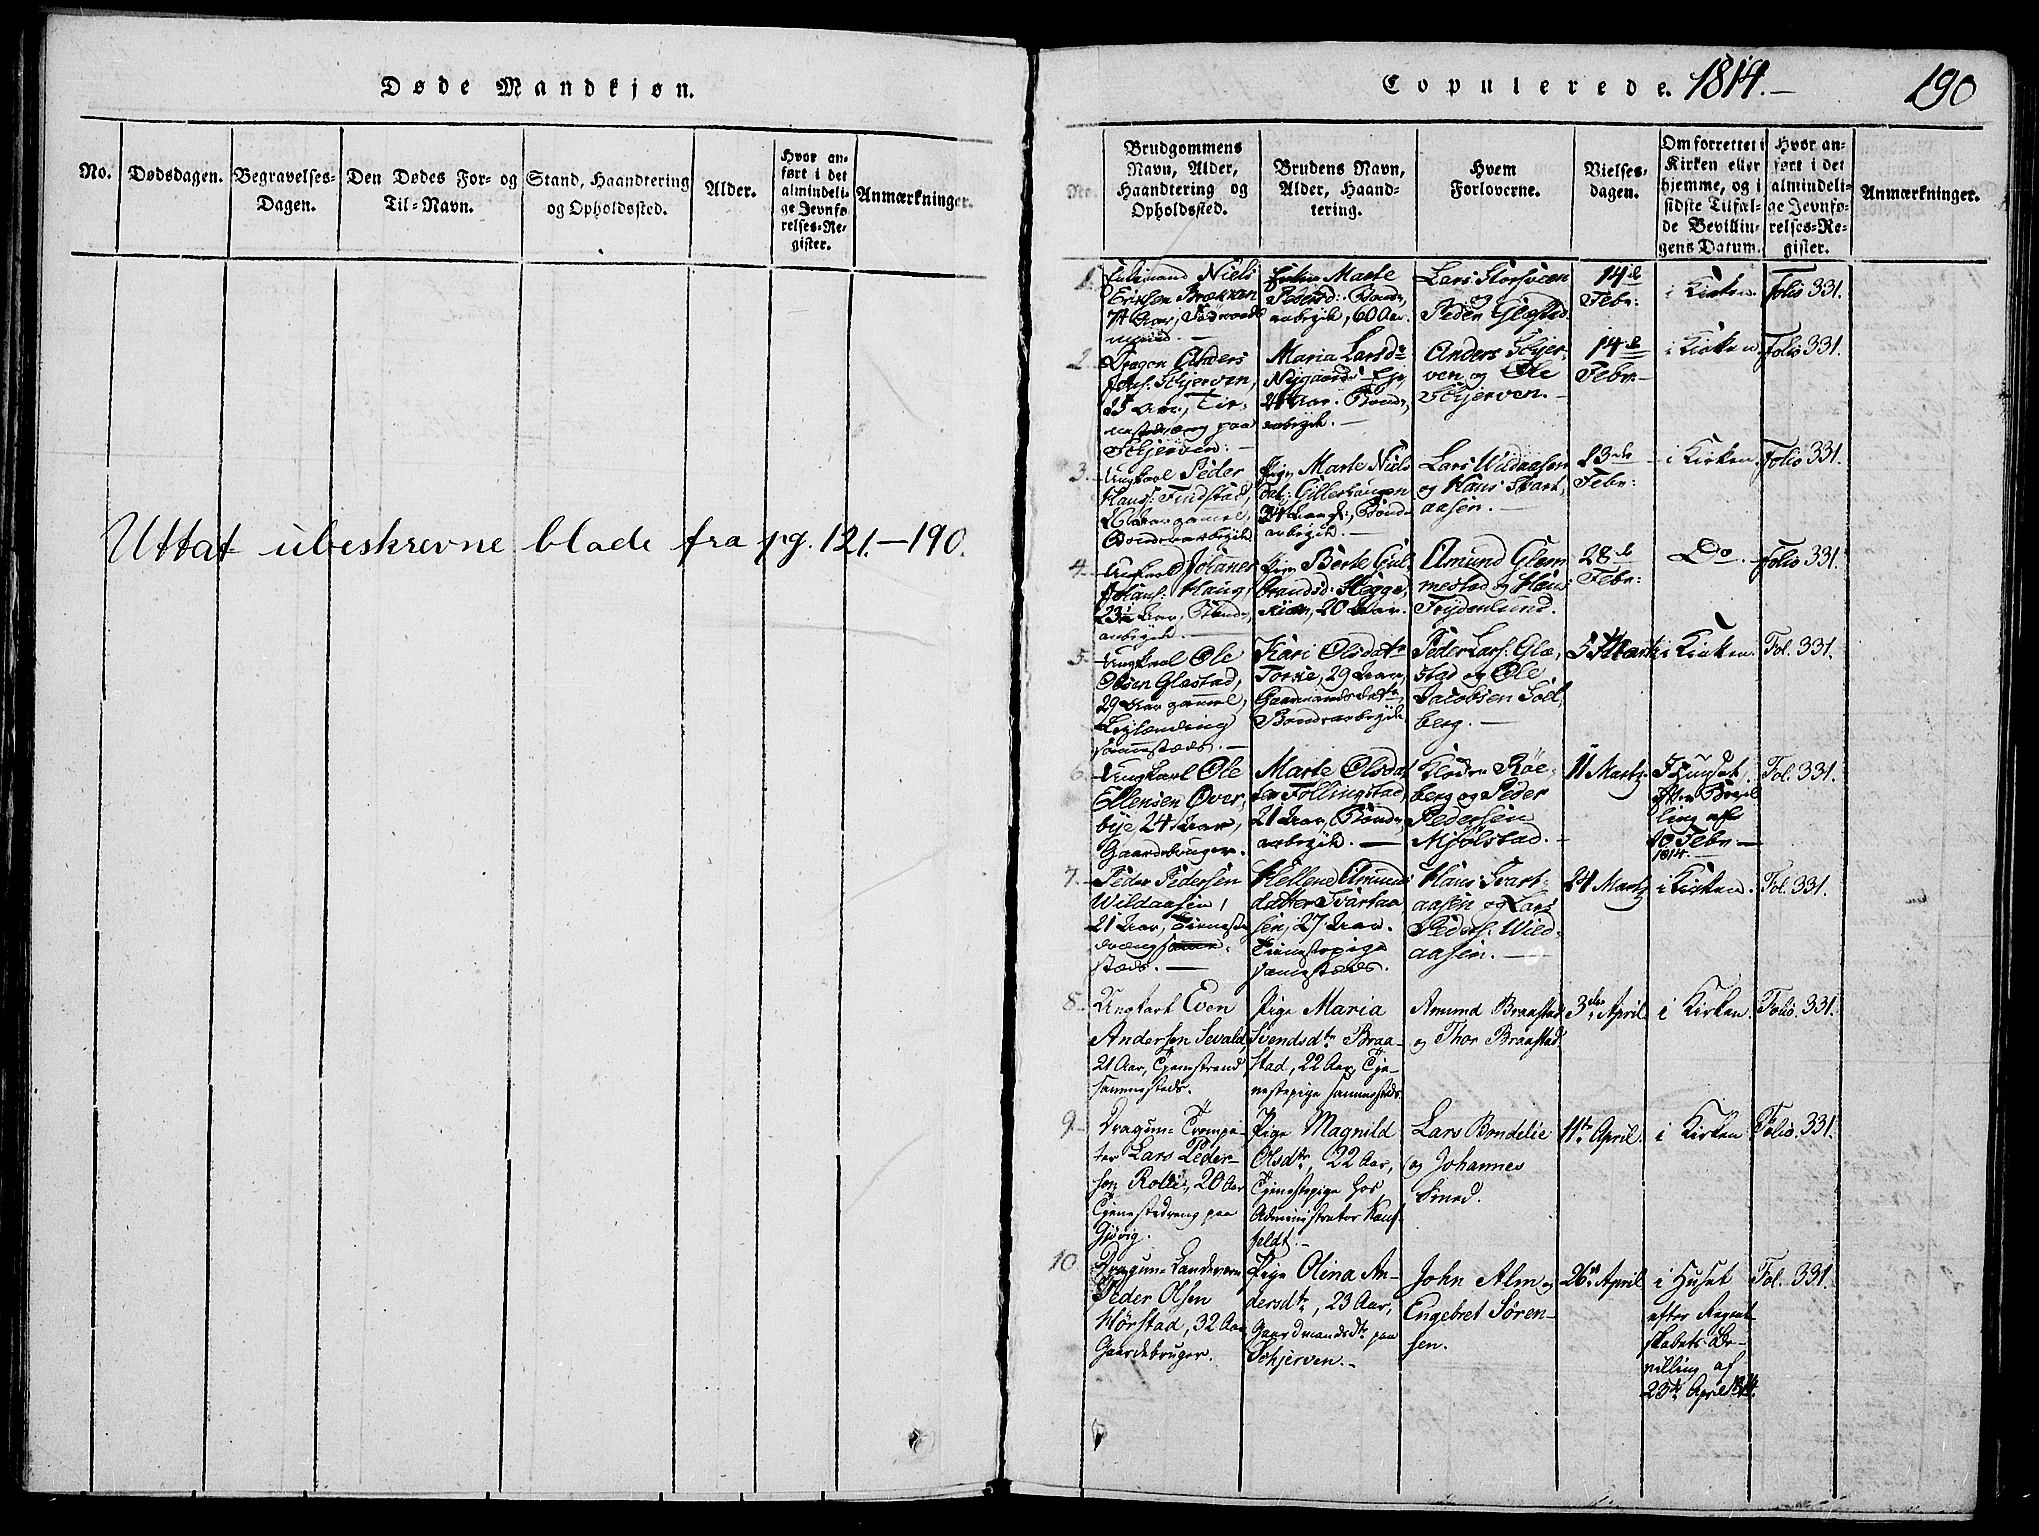 SAH, Vardal prestekontor, H/Ha/Haa/L0004: Ministerialbok nr. 4, 1814-1831, s. 190